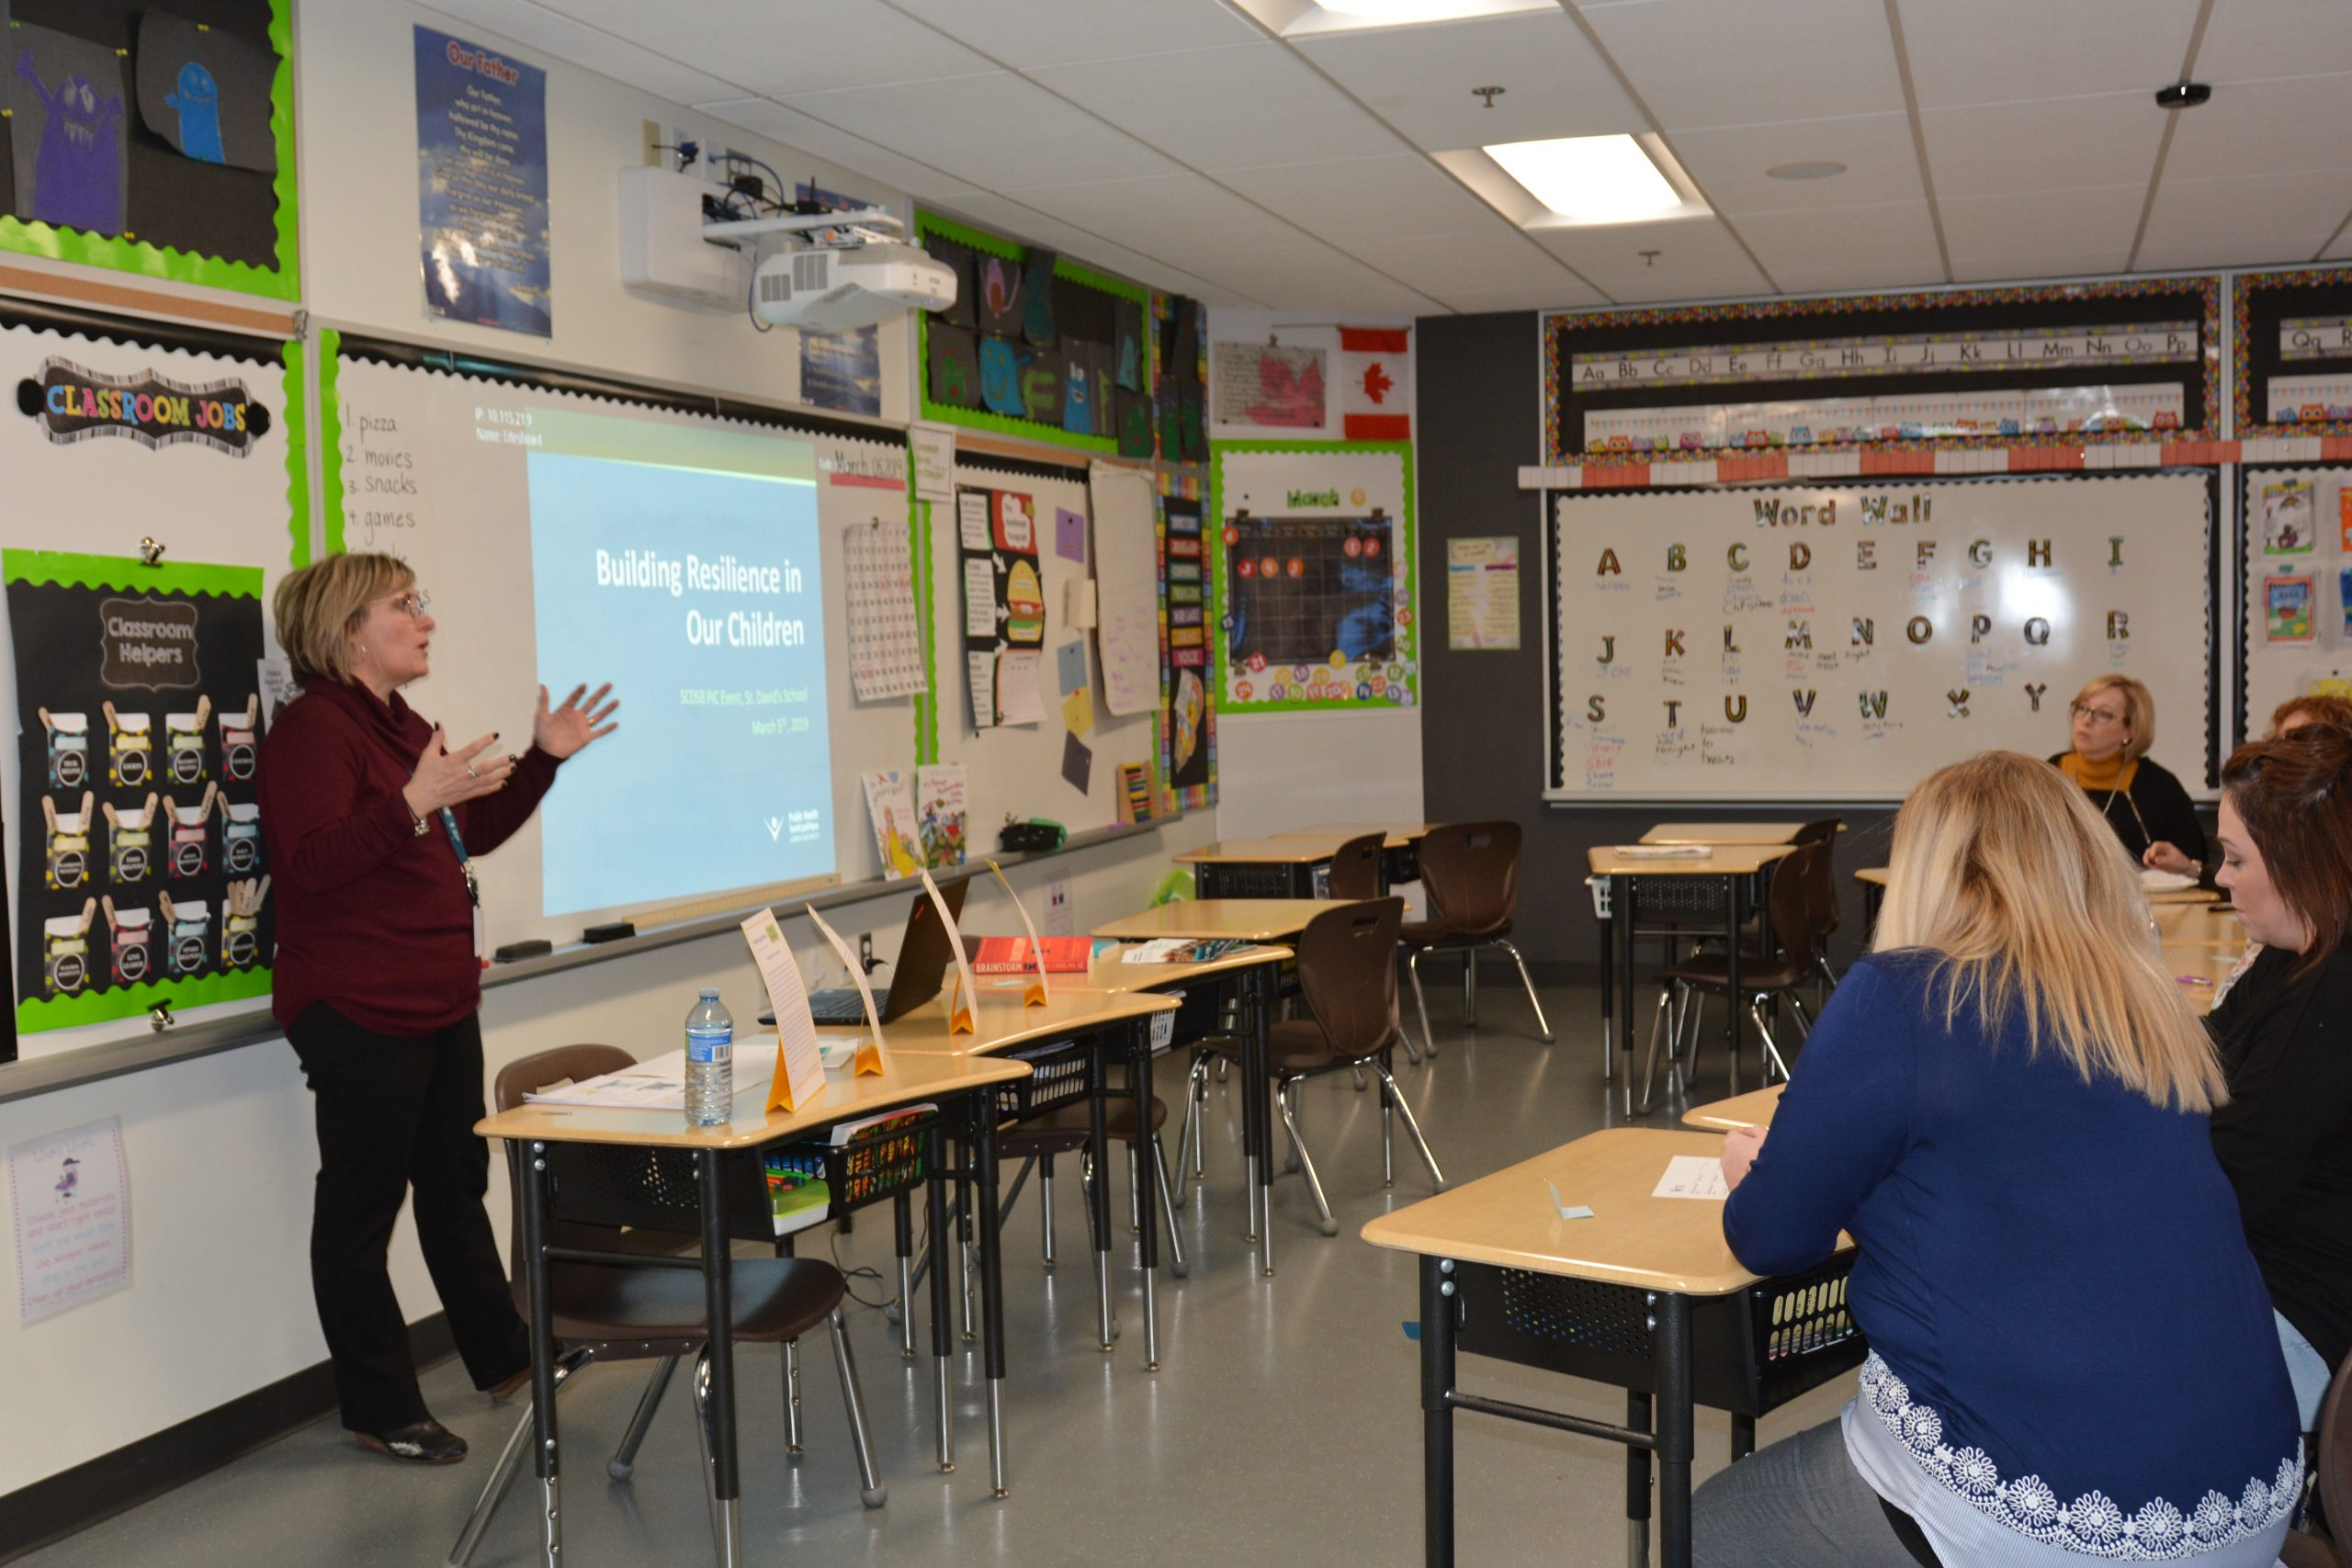 A women talks to a classroom full of parents.